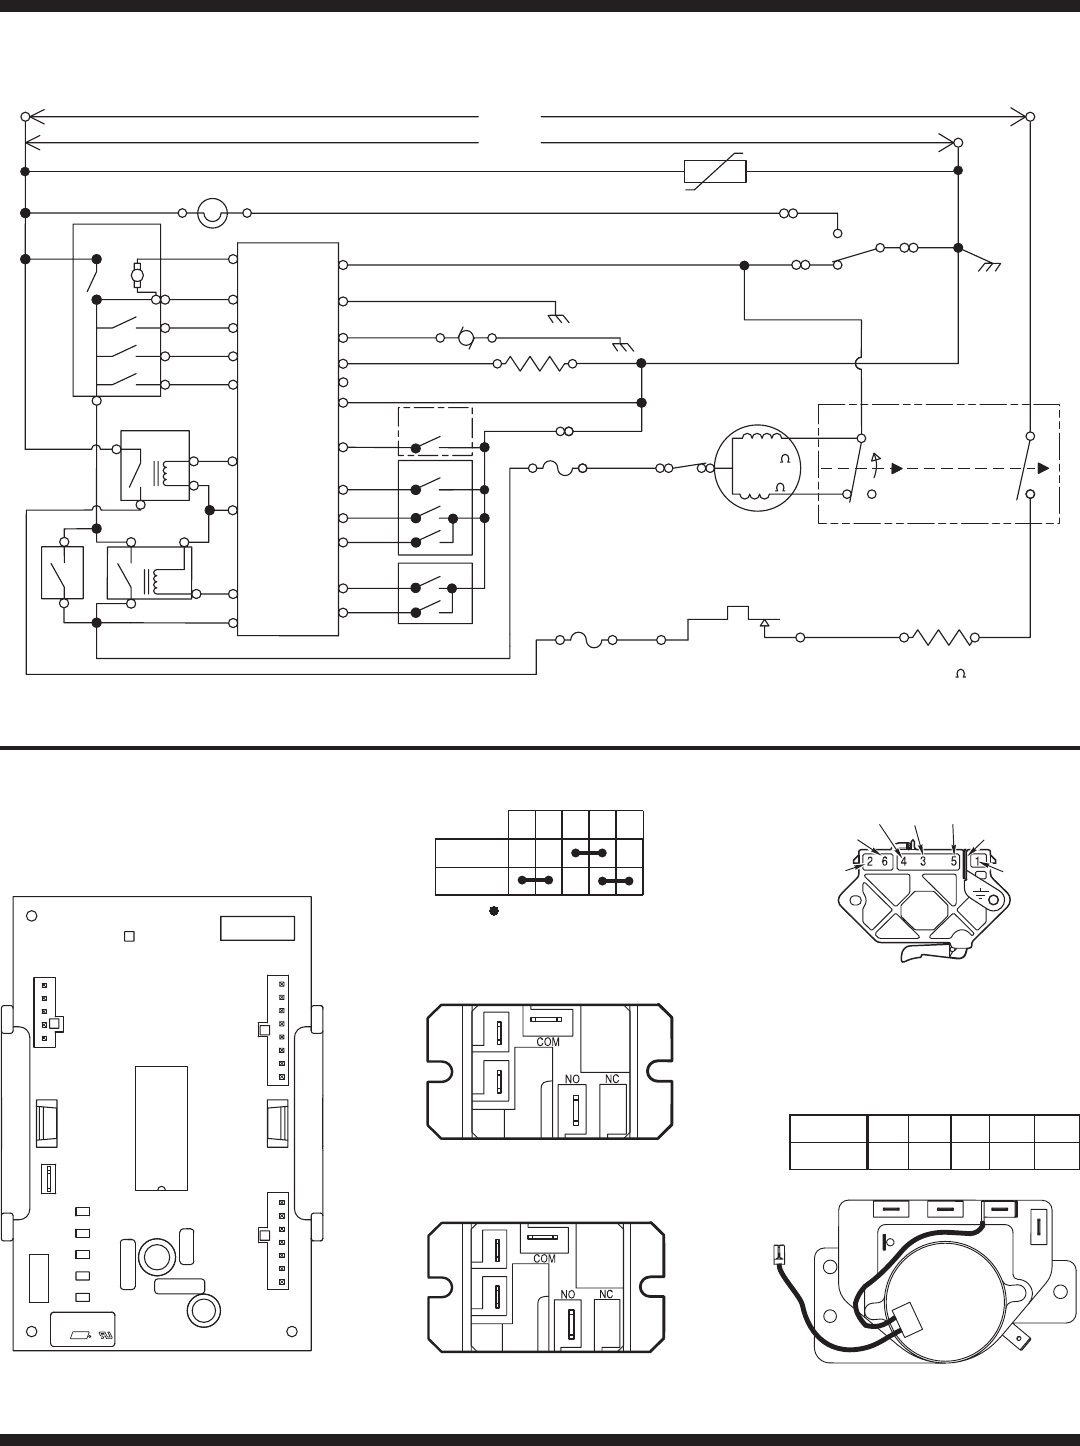 Anne\annedata\ZB20406_39797... Kenmore Dryer Tech Sheet 110 ... on